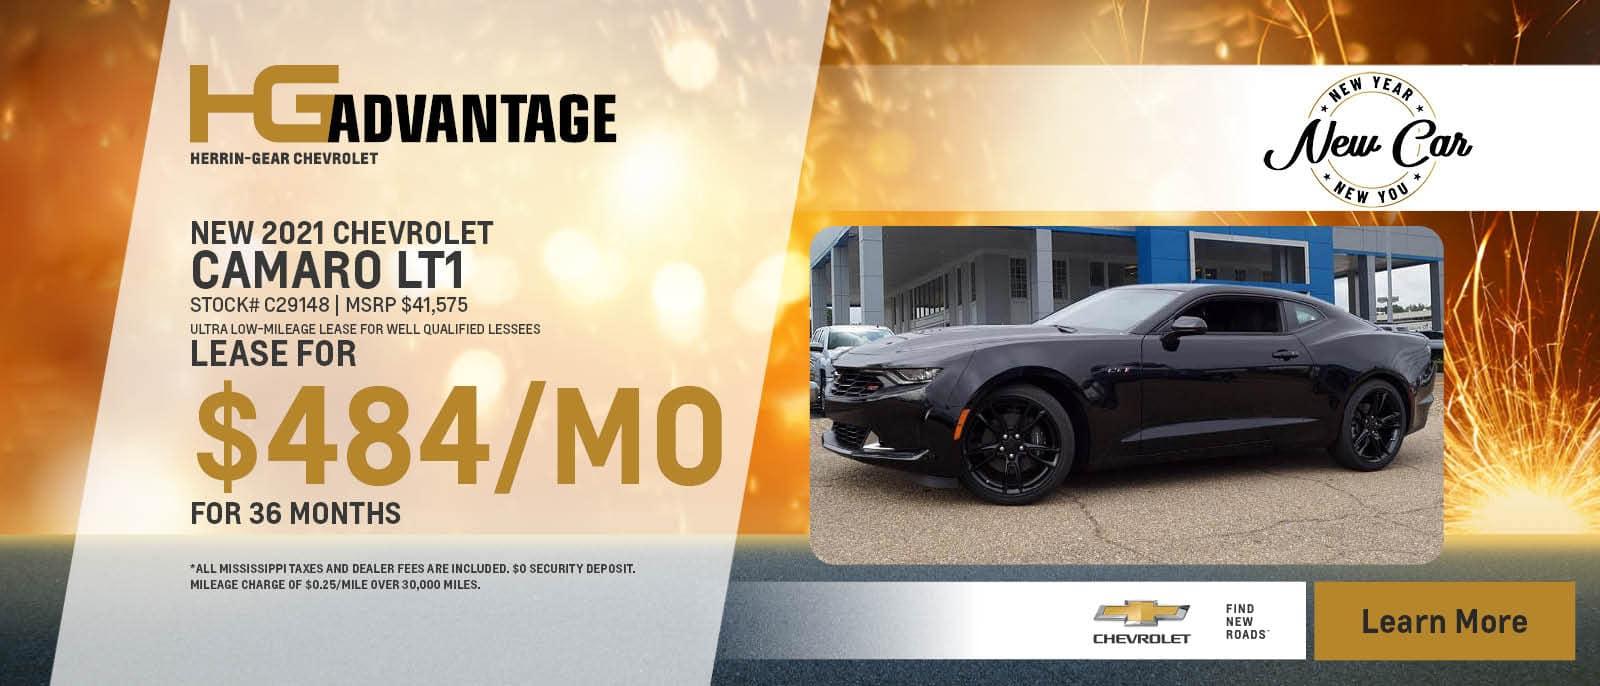 Herrin Gear Chevrolet_11355_00010437_UX_HPB_Camaro